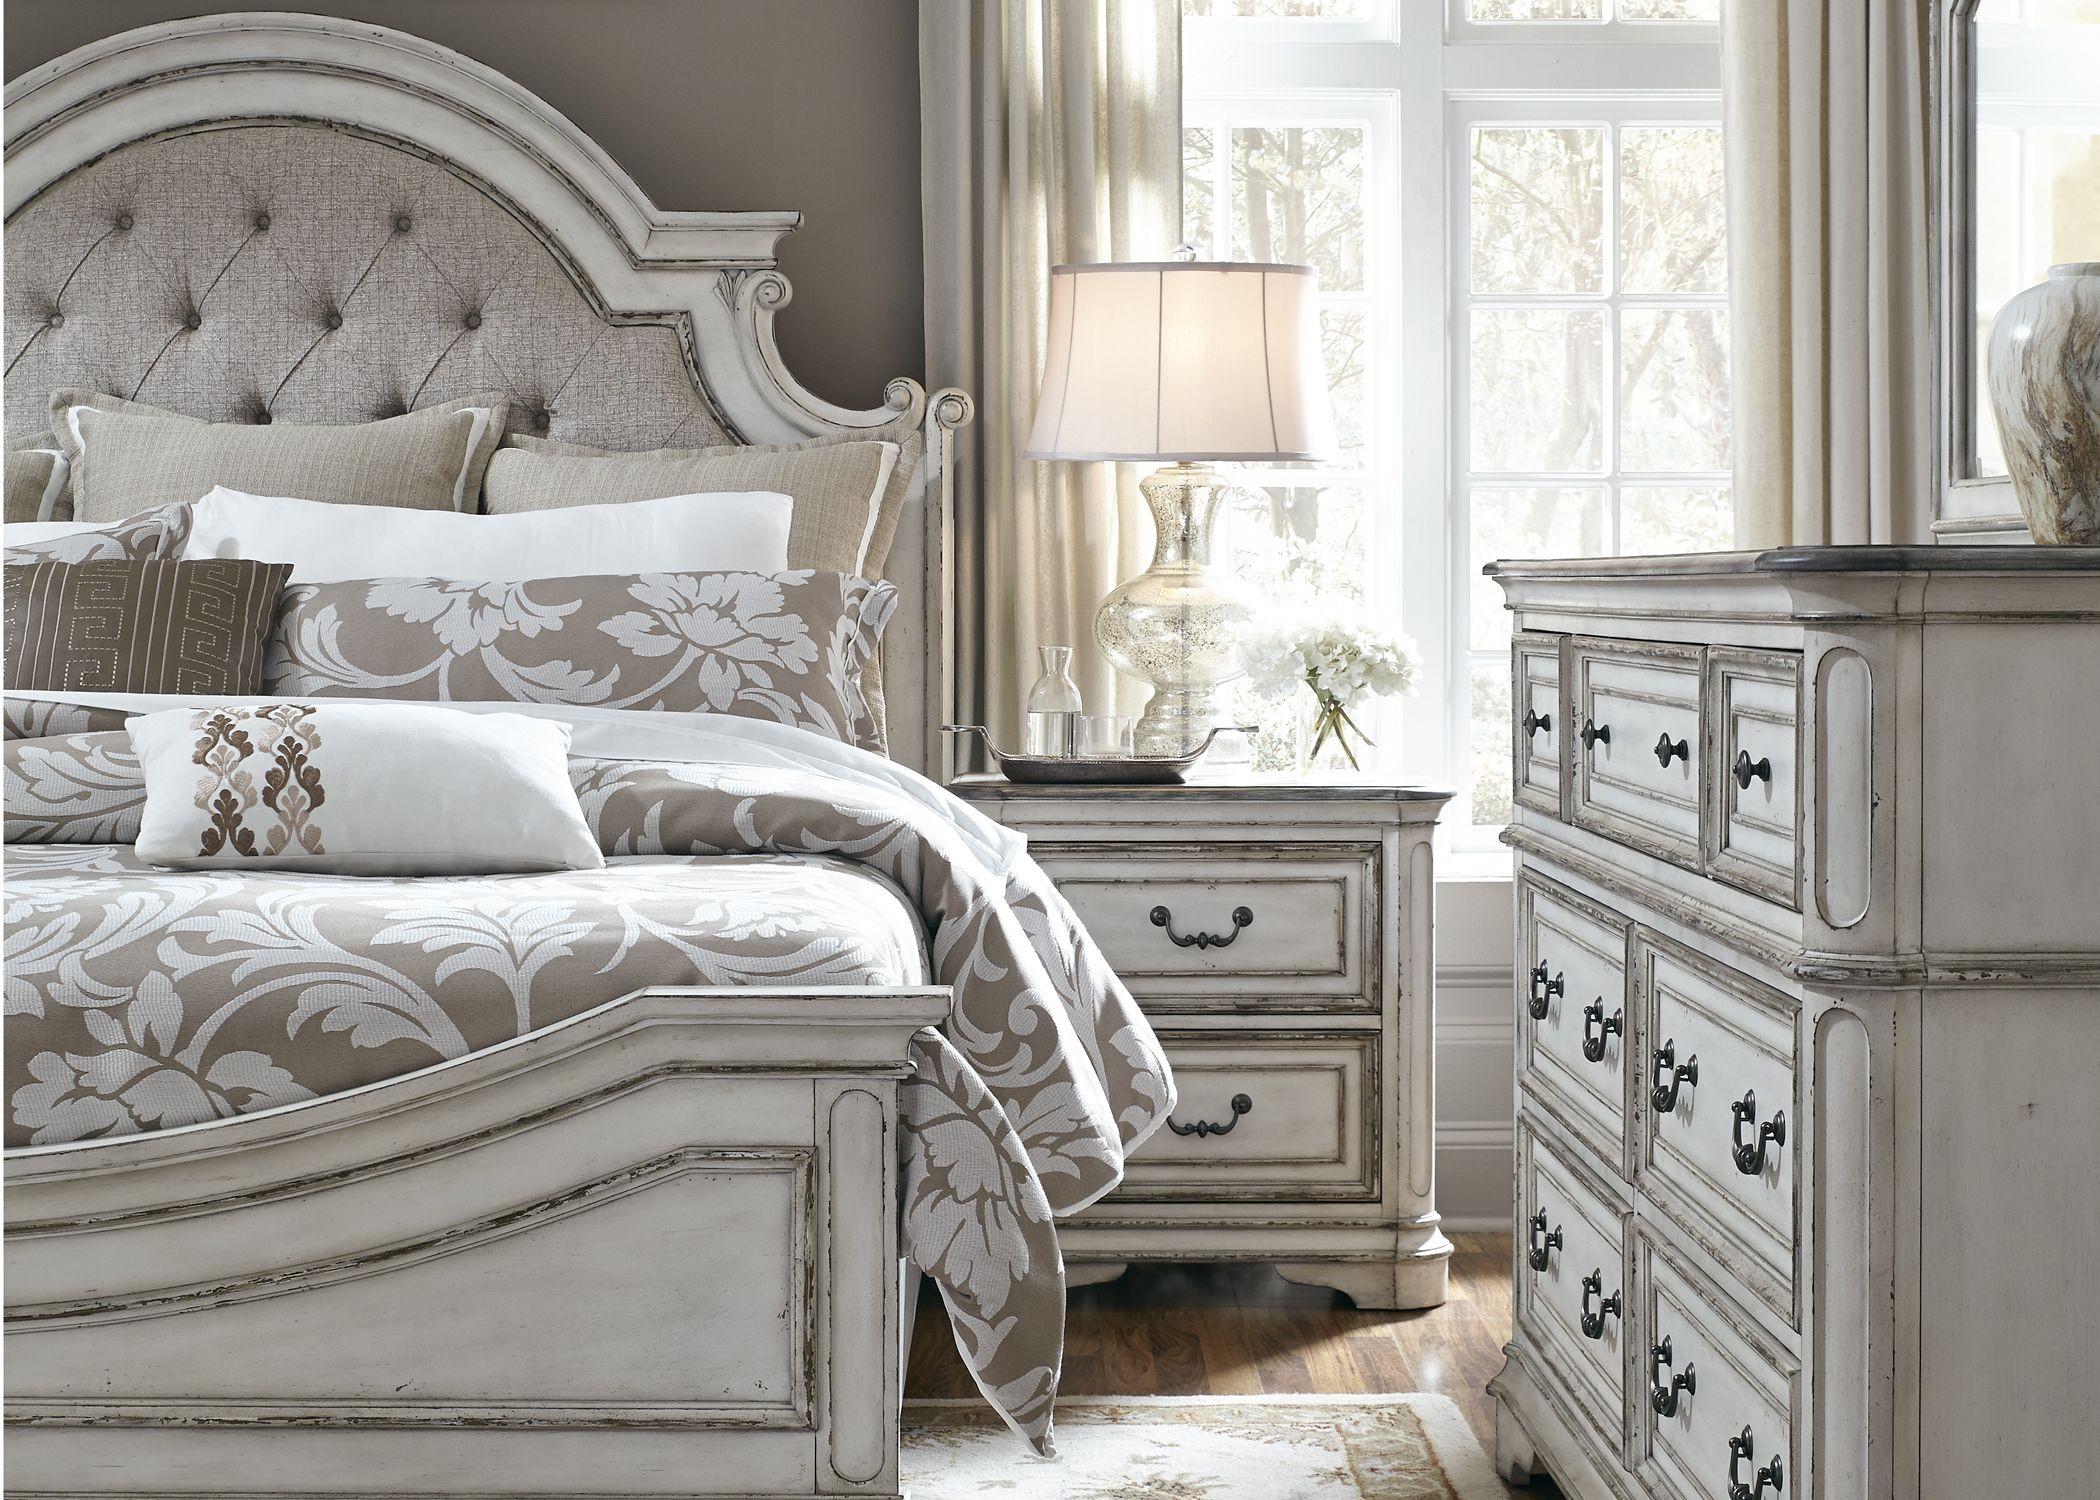 Magnolia Manor Antique White Upholstered Panel Bedroom Set